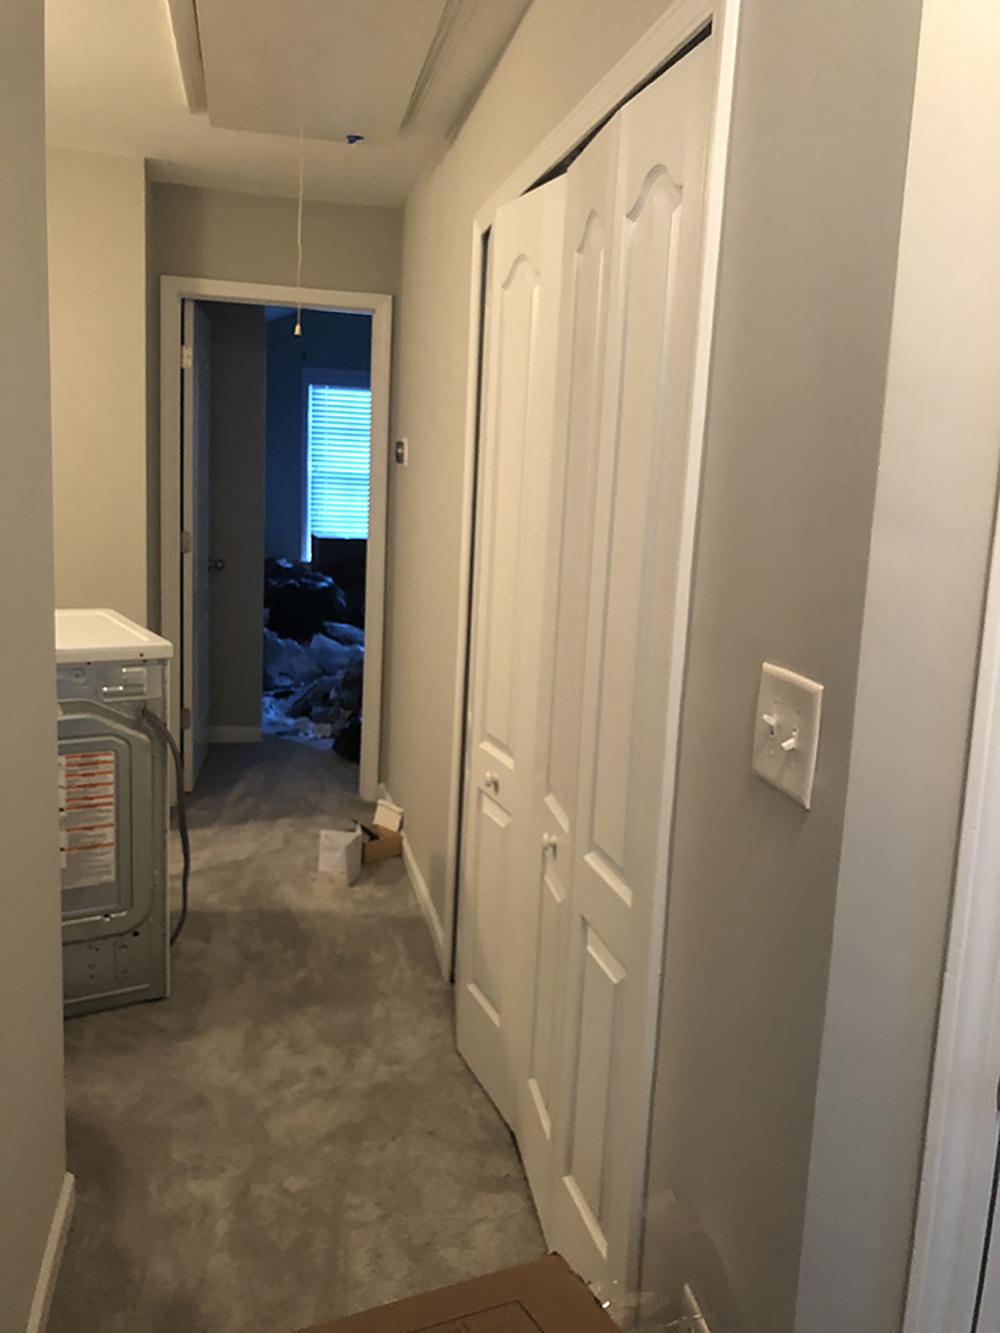 A washing machine sitting in a carpeted hallway.